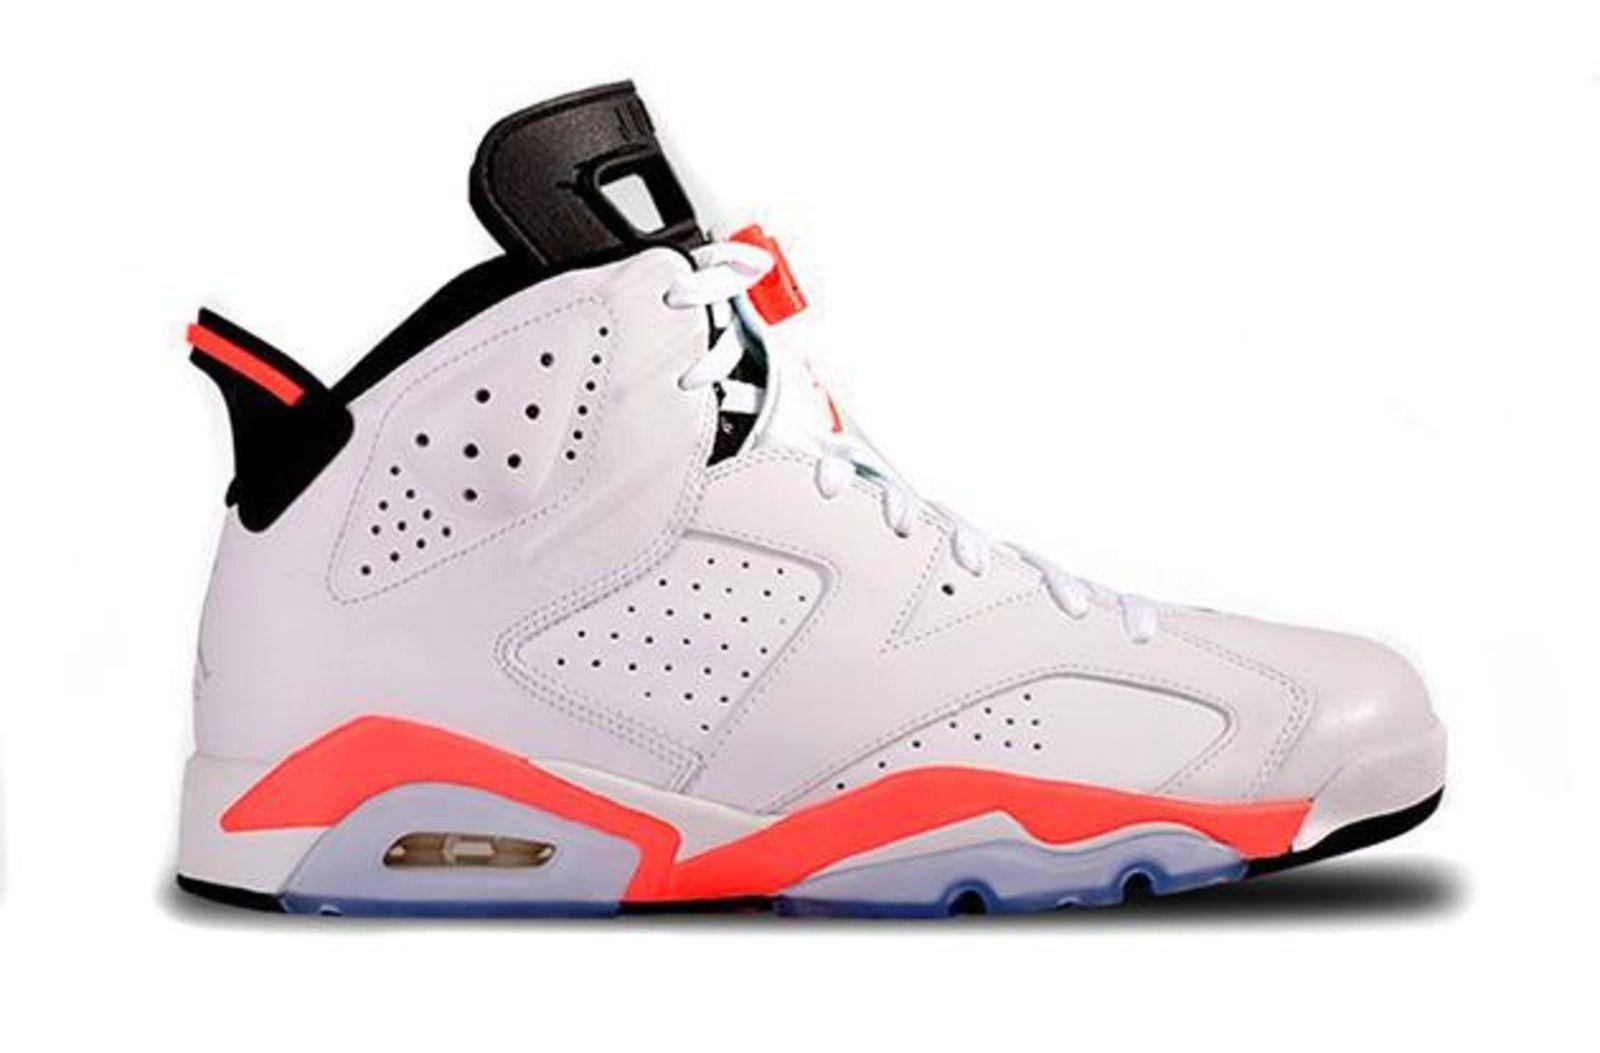 bas prix c4da7 5fd84 The 25 Best-Selling Air Jordans | BEST SELLING JORDANS ...